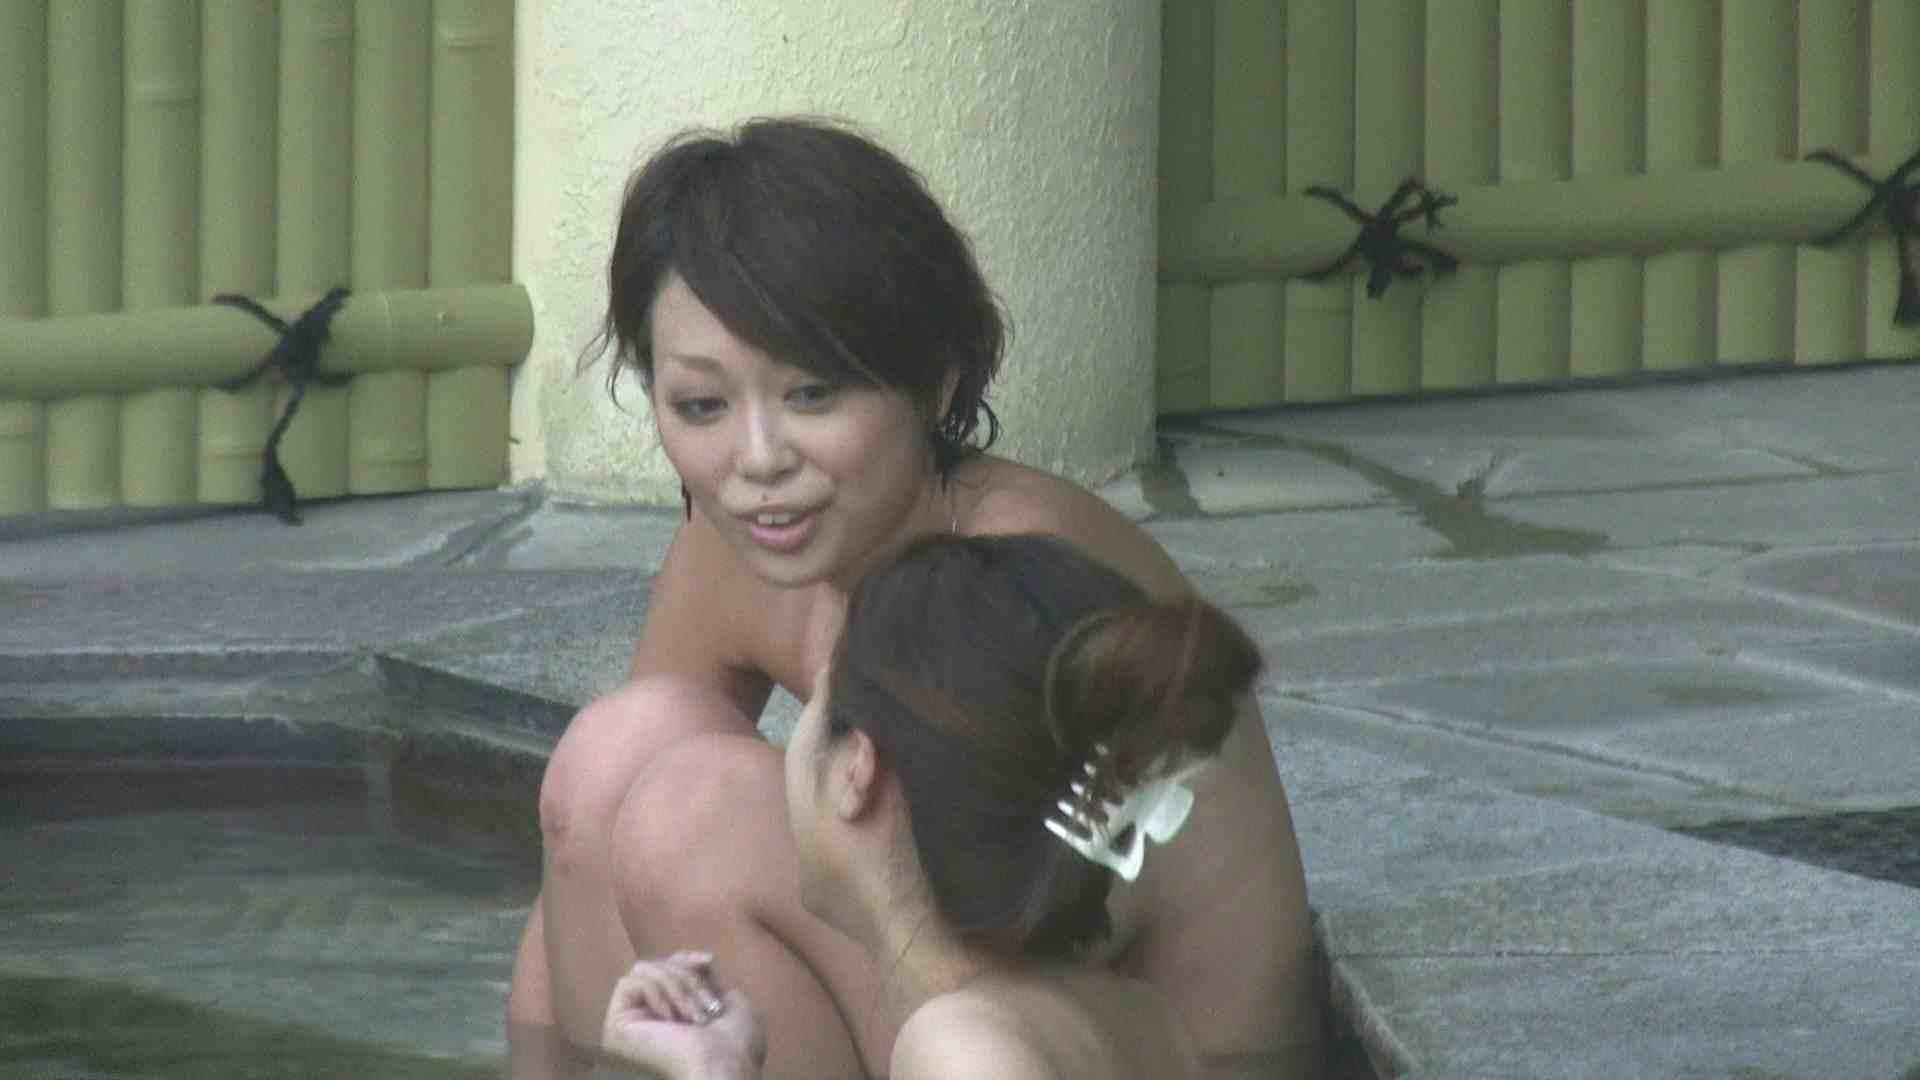 Aquaな露天風呂Vol.201 露天風呂編  102PIX 96